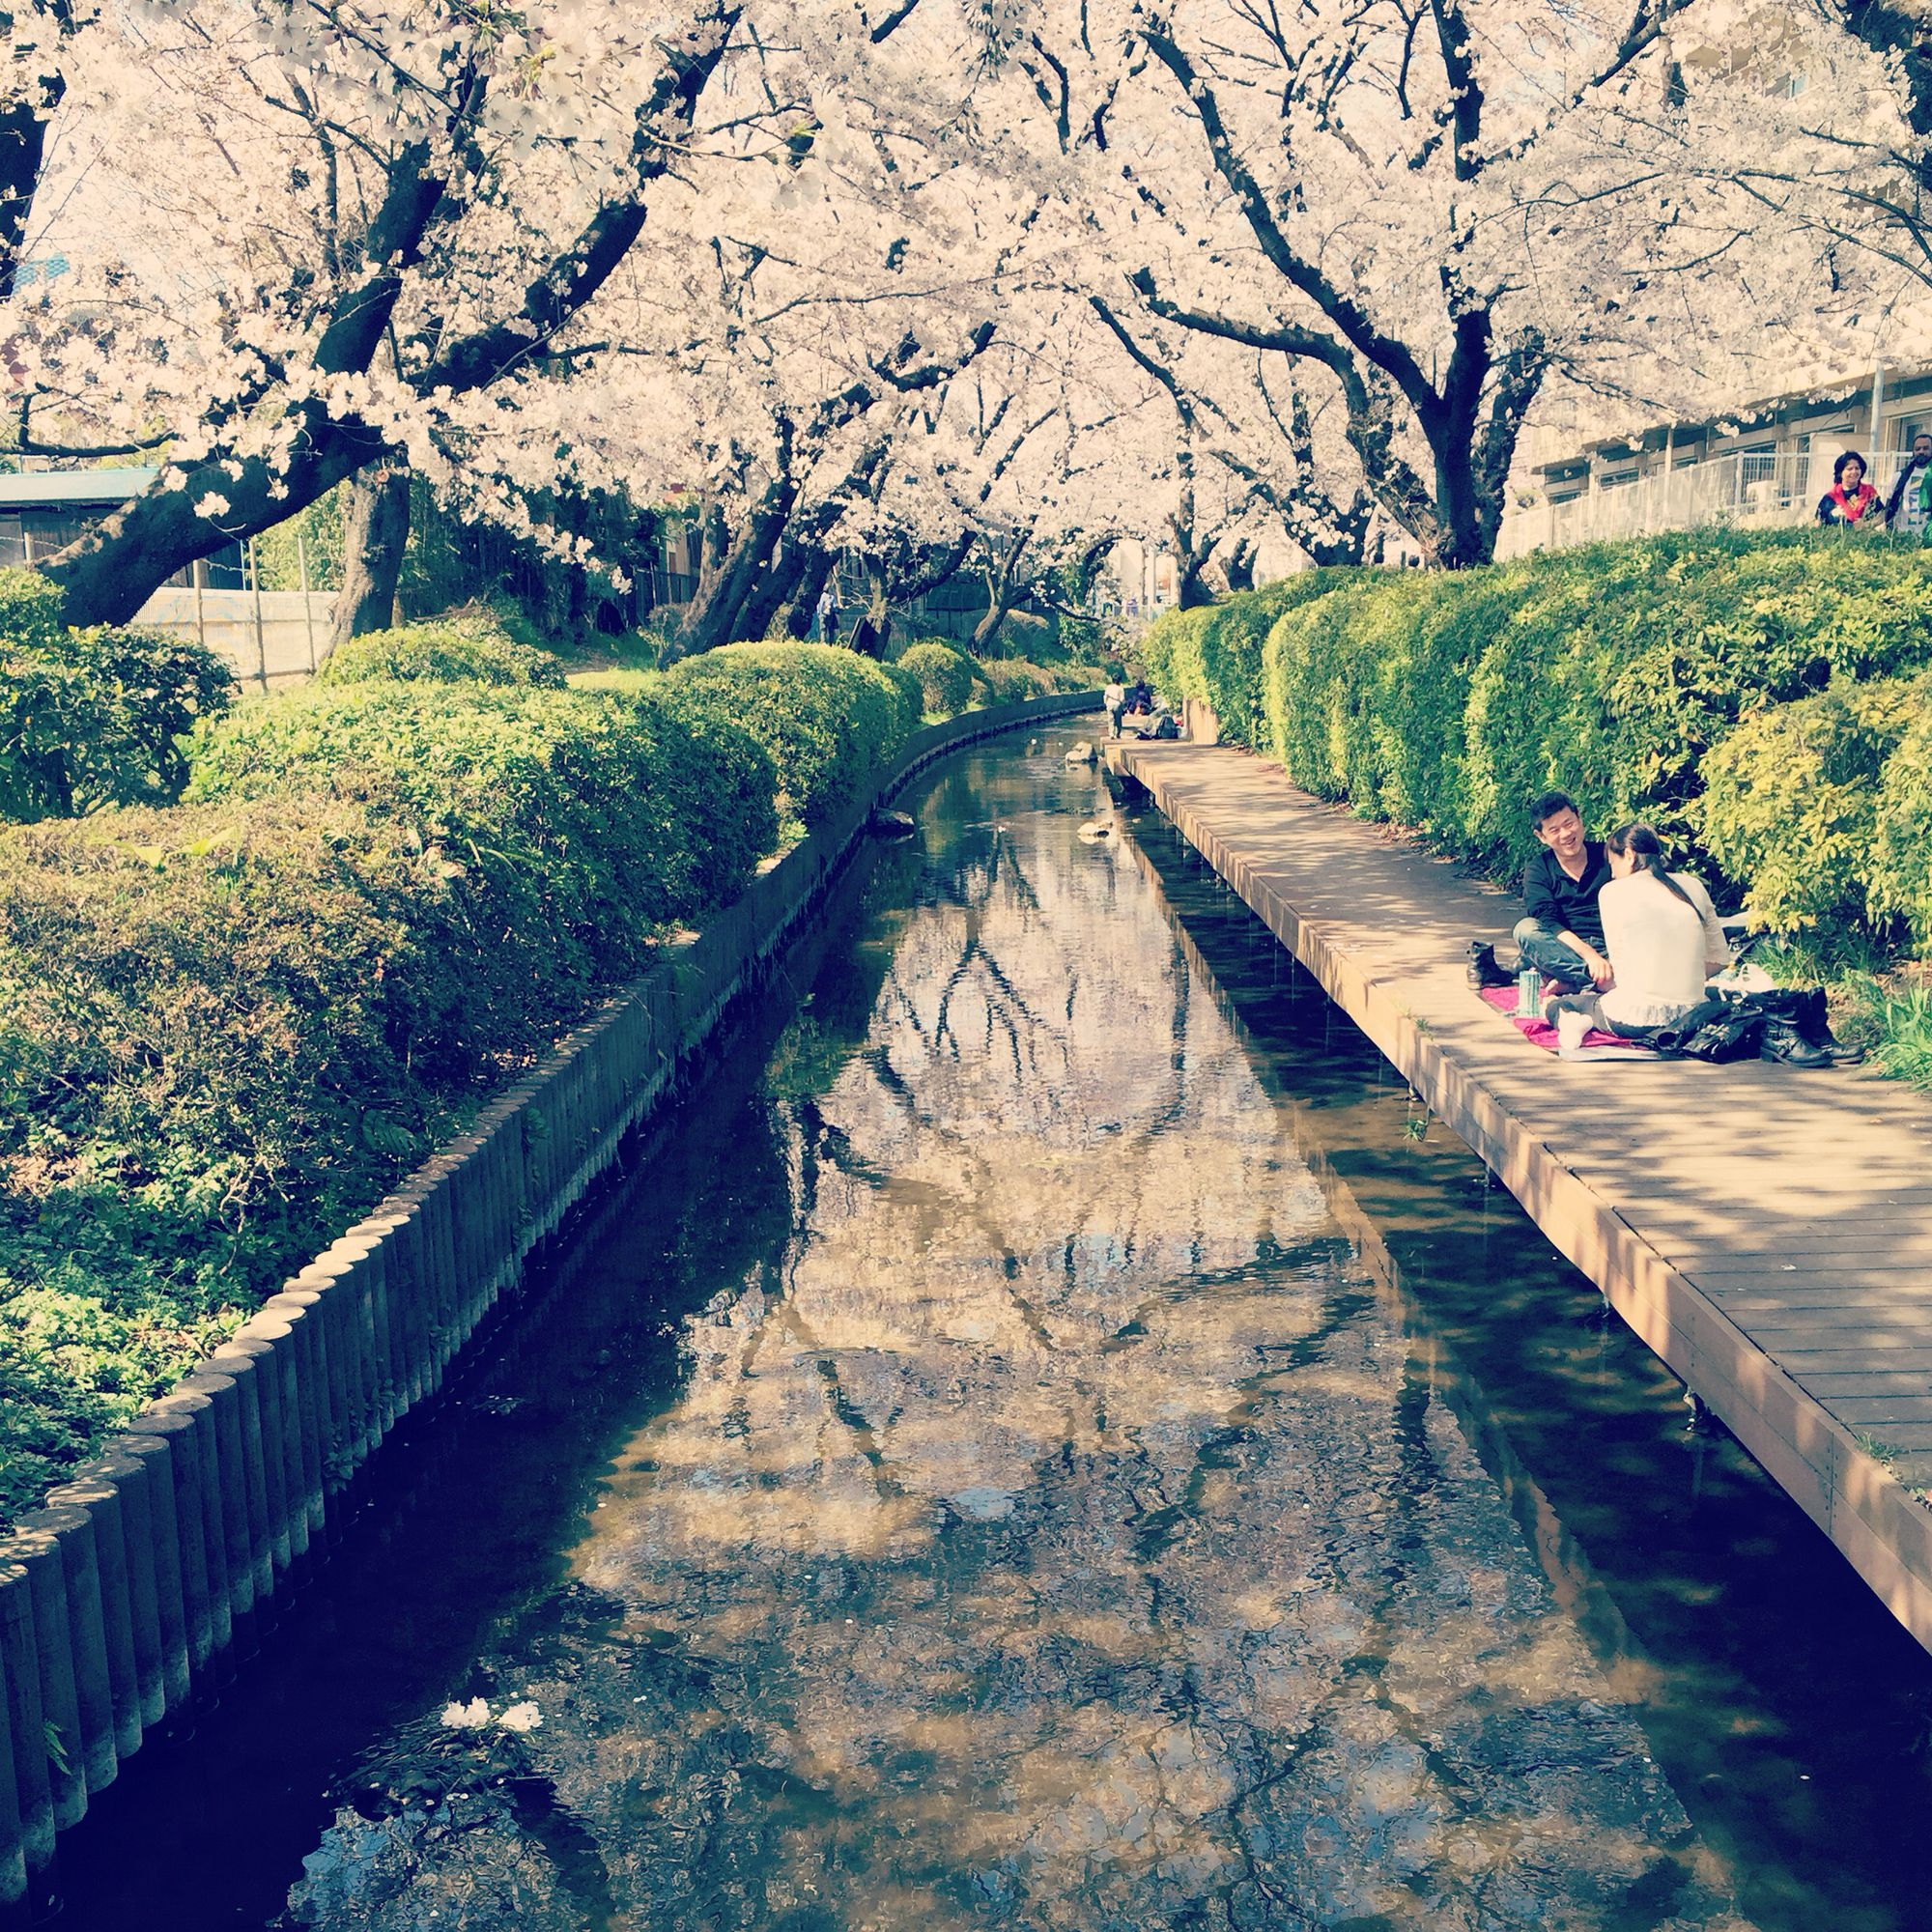 #日常,#日本,#JAPAN,#青空,#sky,#桜,#cherryblossom,#春,#Spring,#花,#flower,#sakura,#